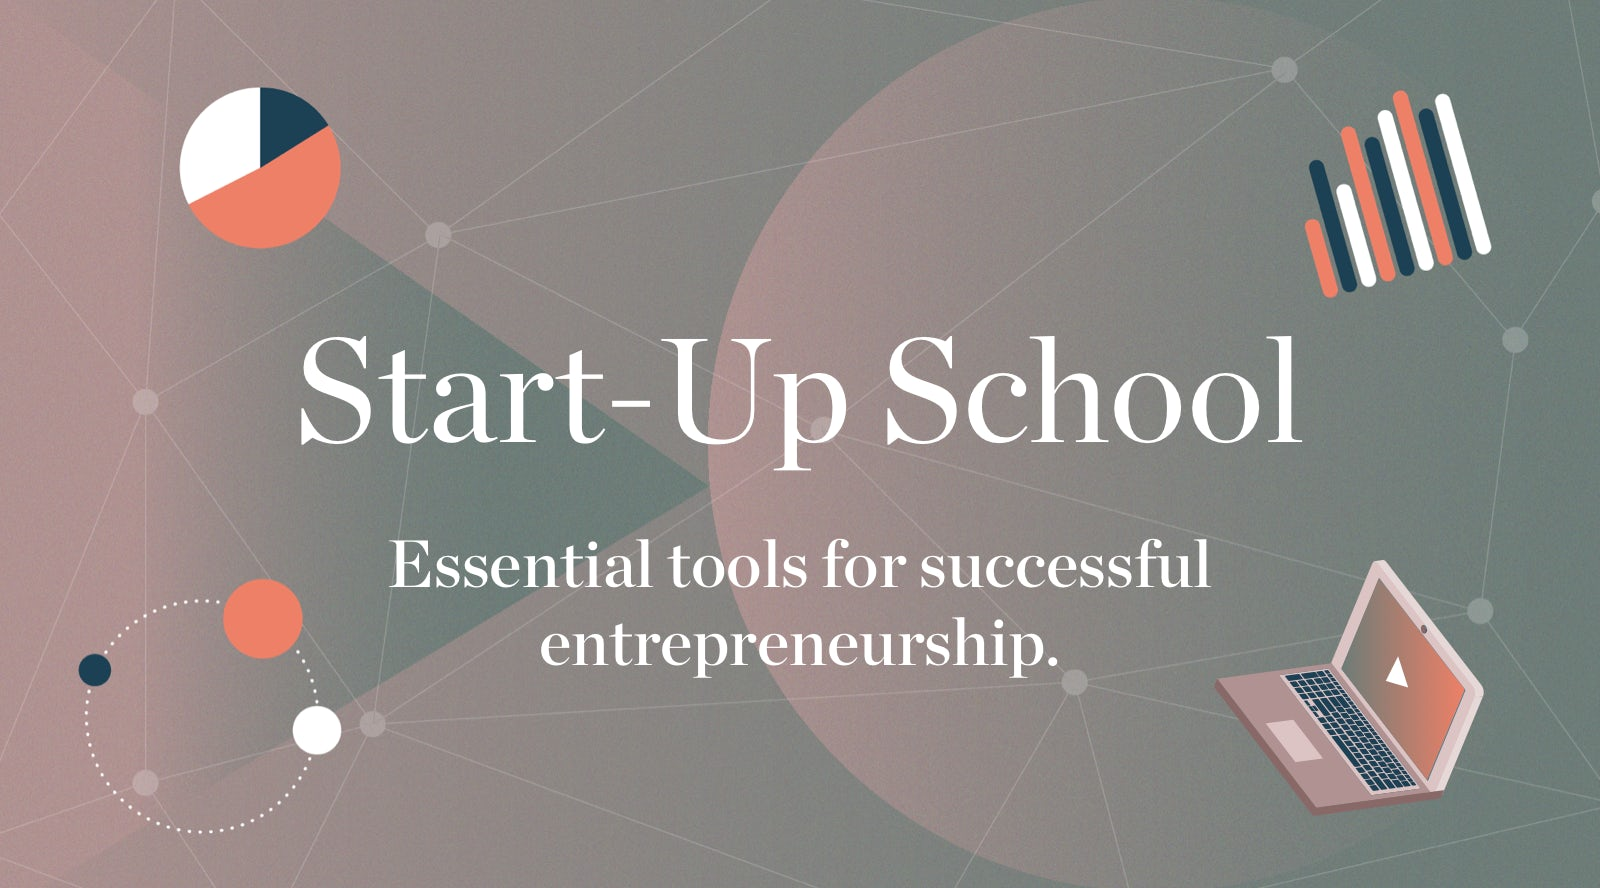 Start-Up School